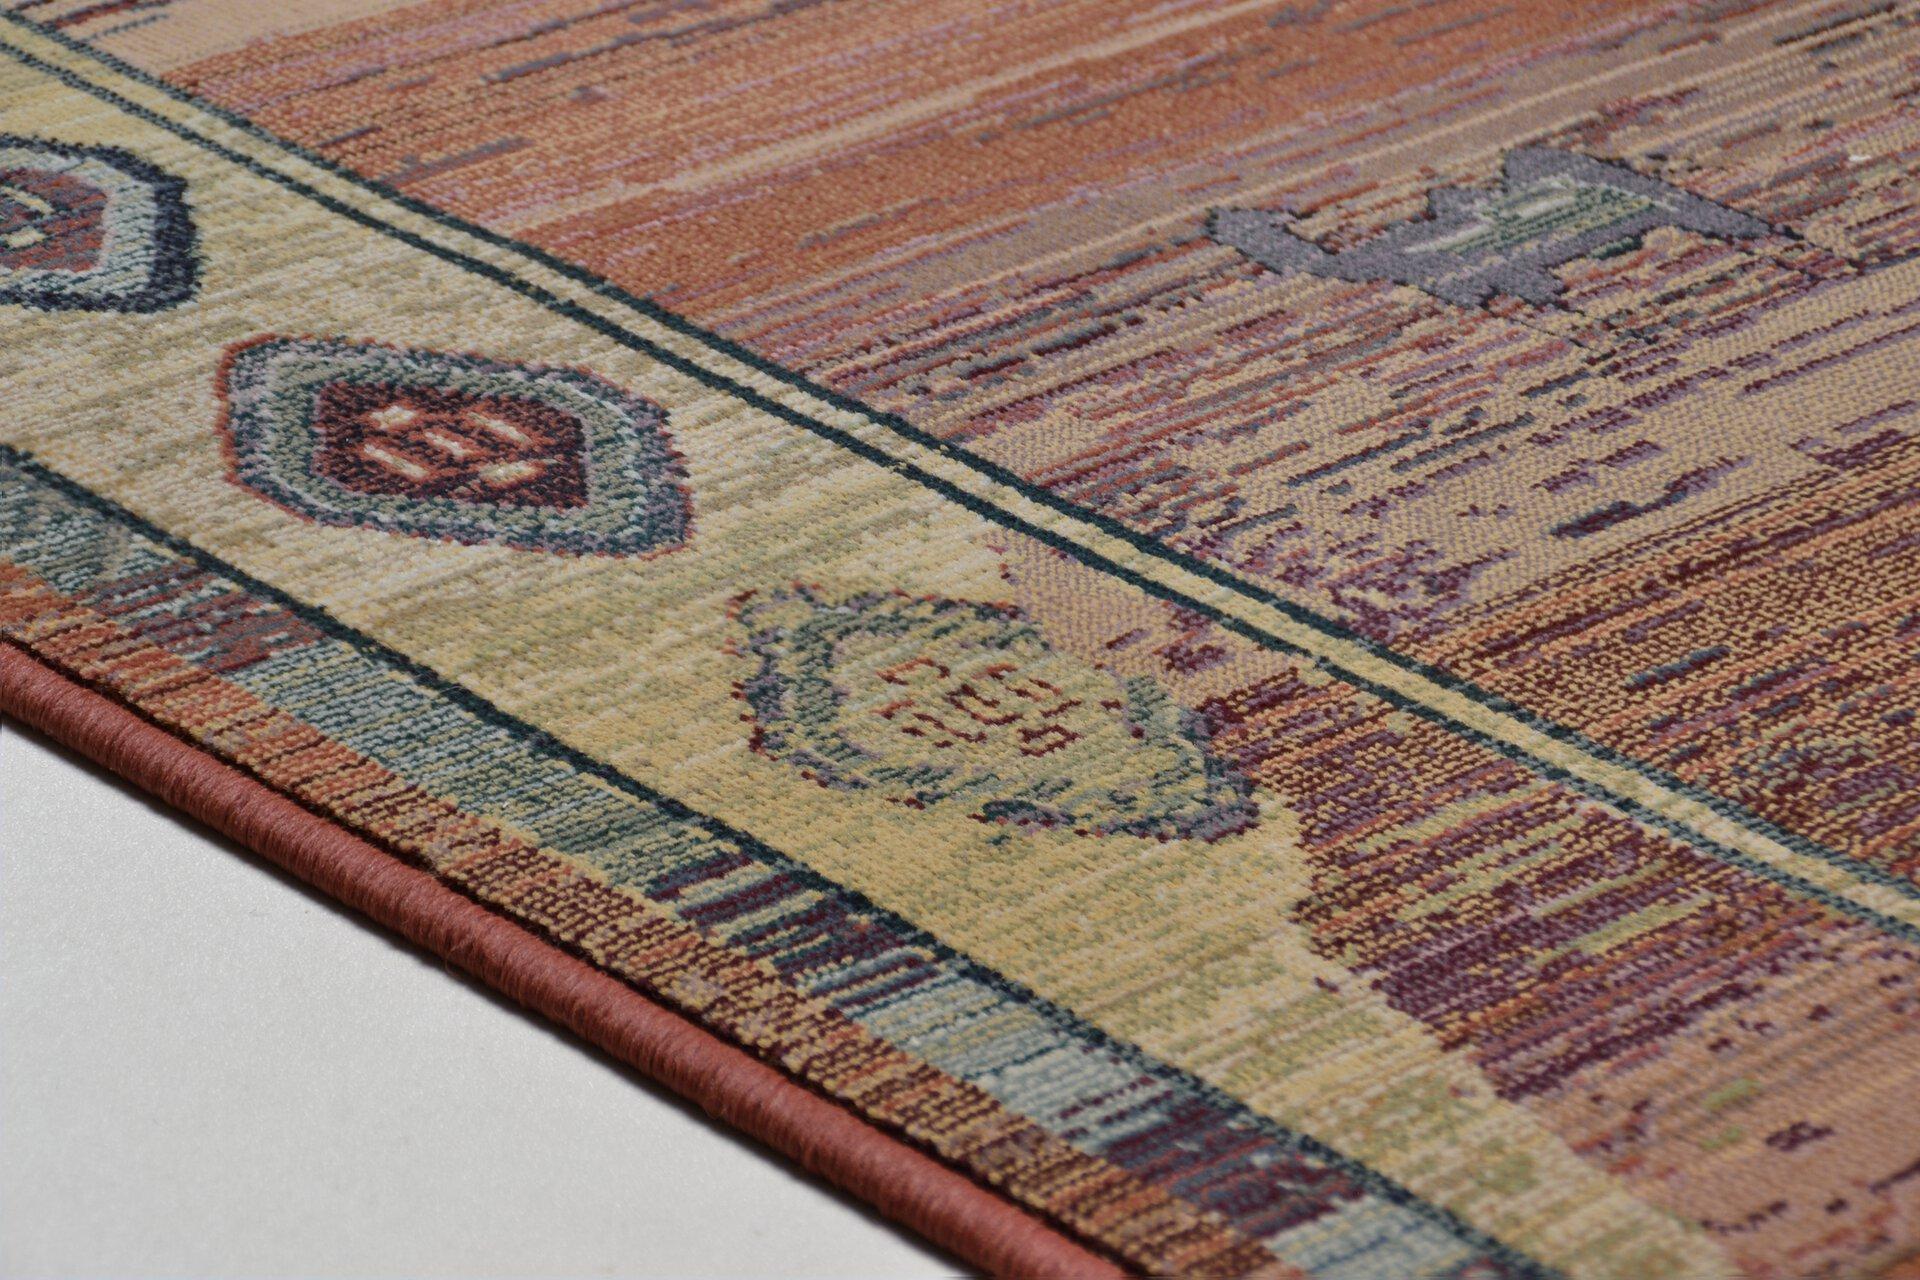 Maschinenwebteppich Gabiro Theko Textil orange 80 x 300 cm